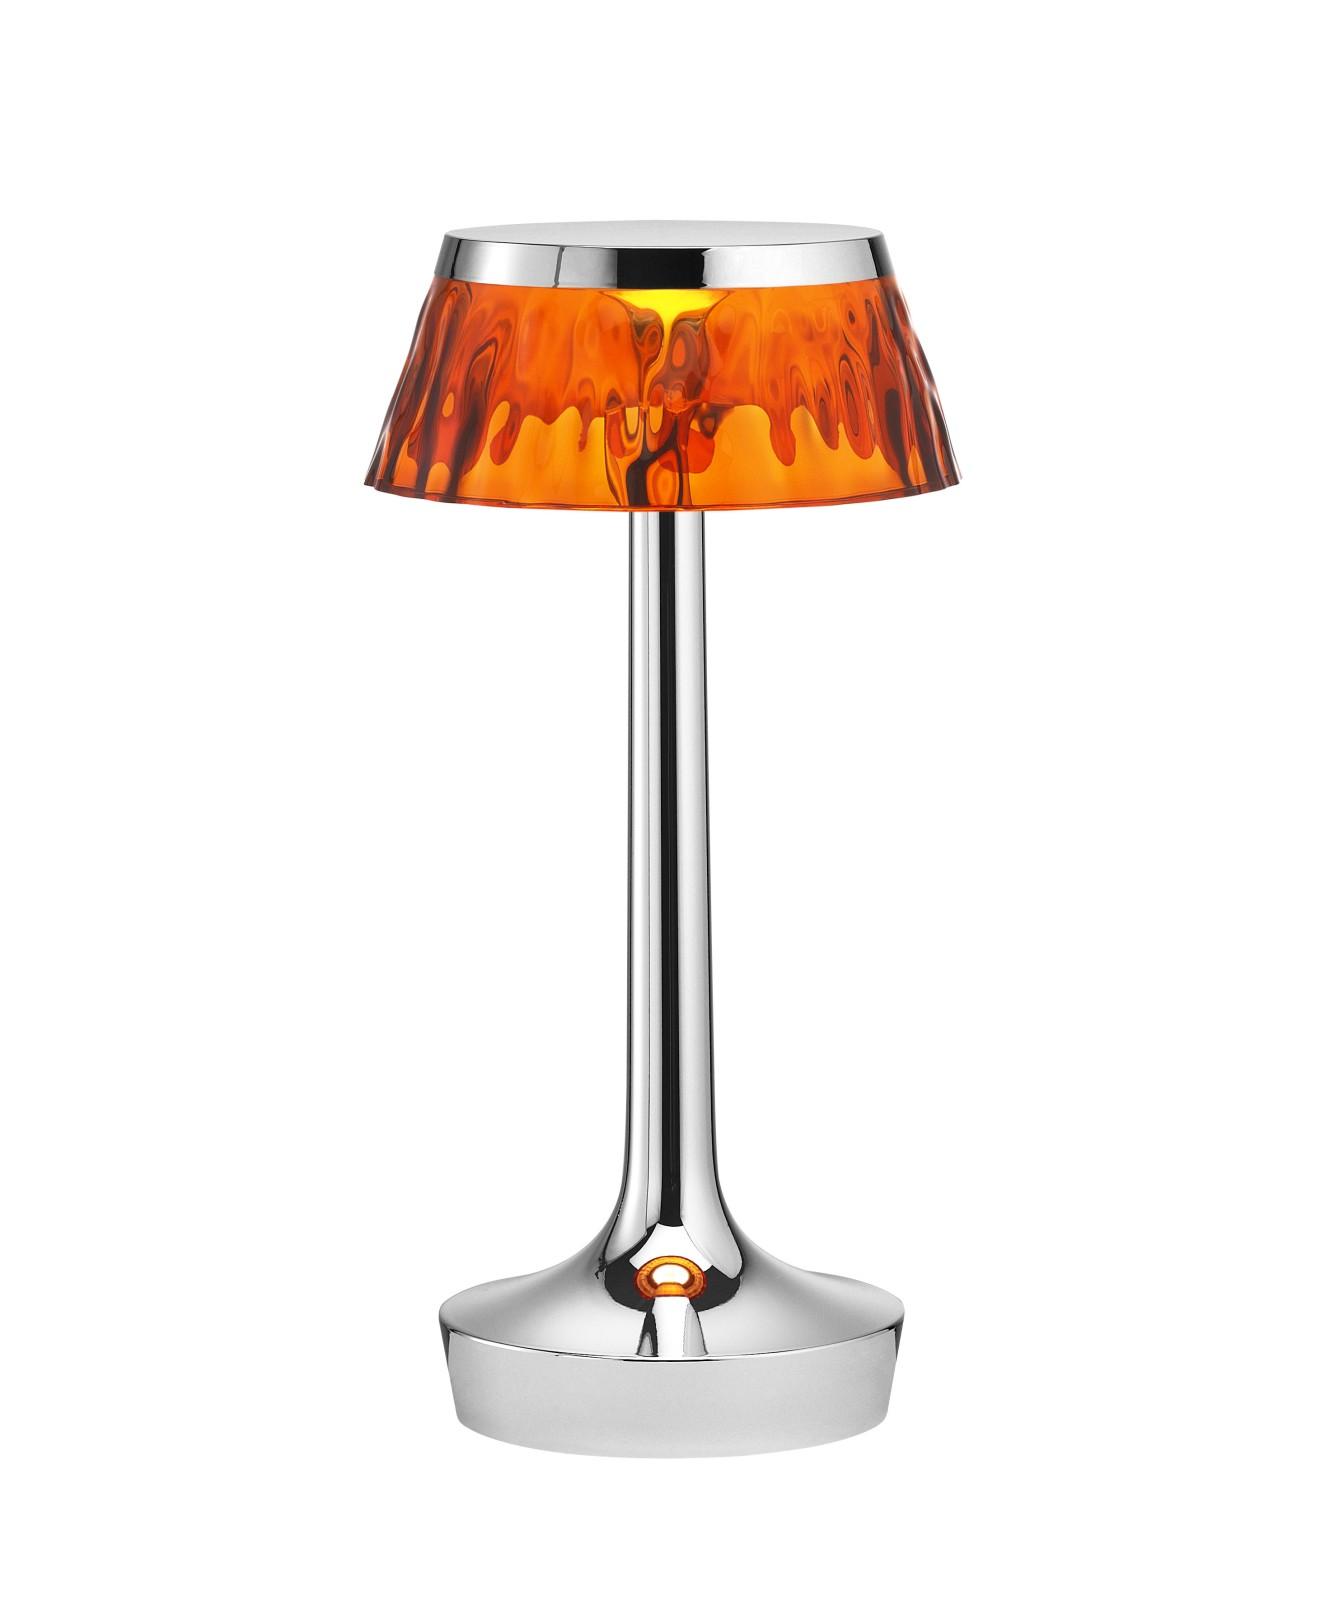 Bon Jour Unplugged Table Lamp Chrome finish, Amber shade